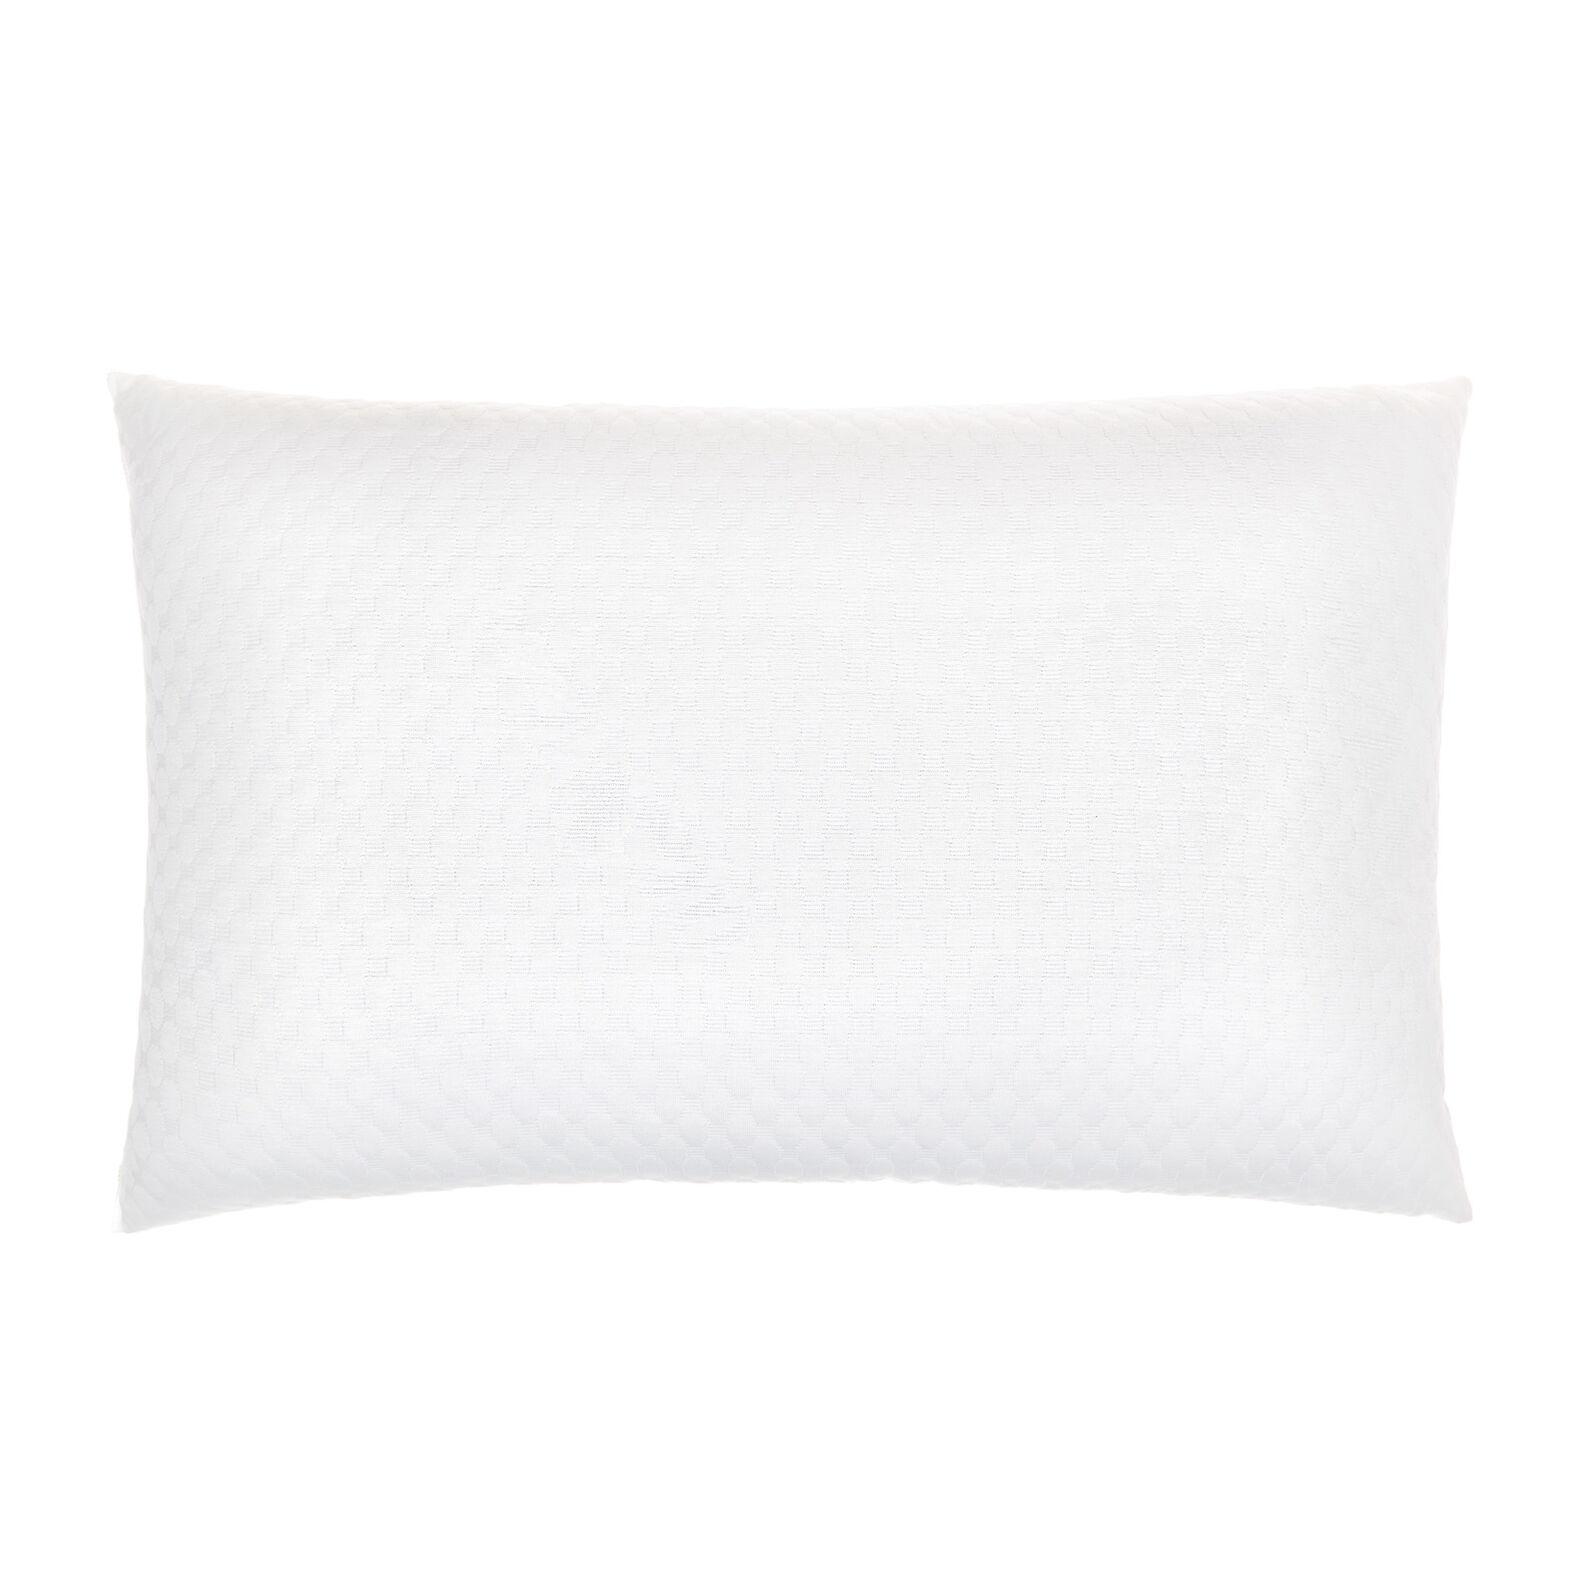 Hypoallergenic aloe vera pillow